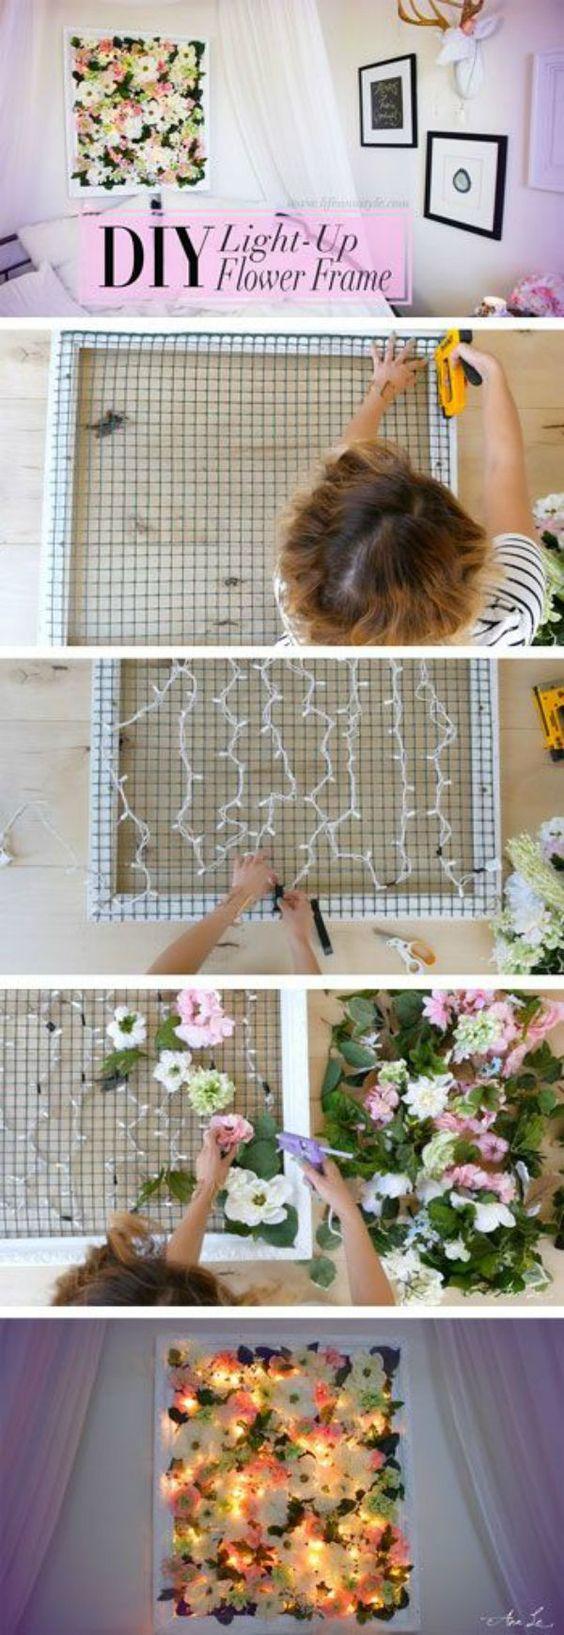 Cheap Bedroom Decor Ideas: DIY Light-Up Flower Frame... - http://centophobe.com/cheap-bedroom-decor-ideas-diy-light-up-flower-frame/ -: